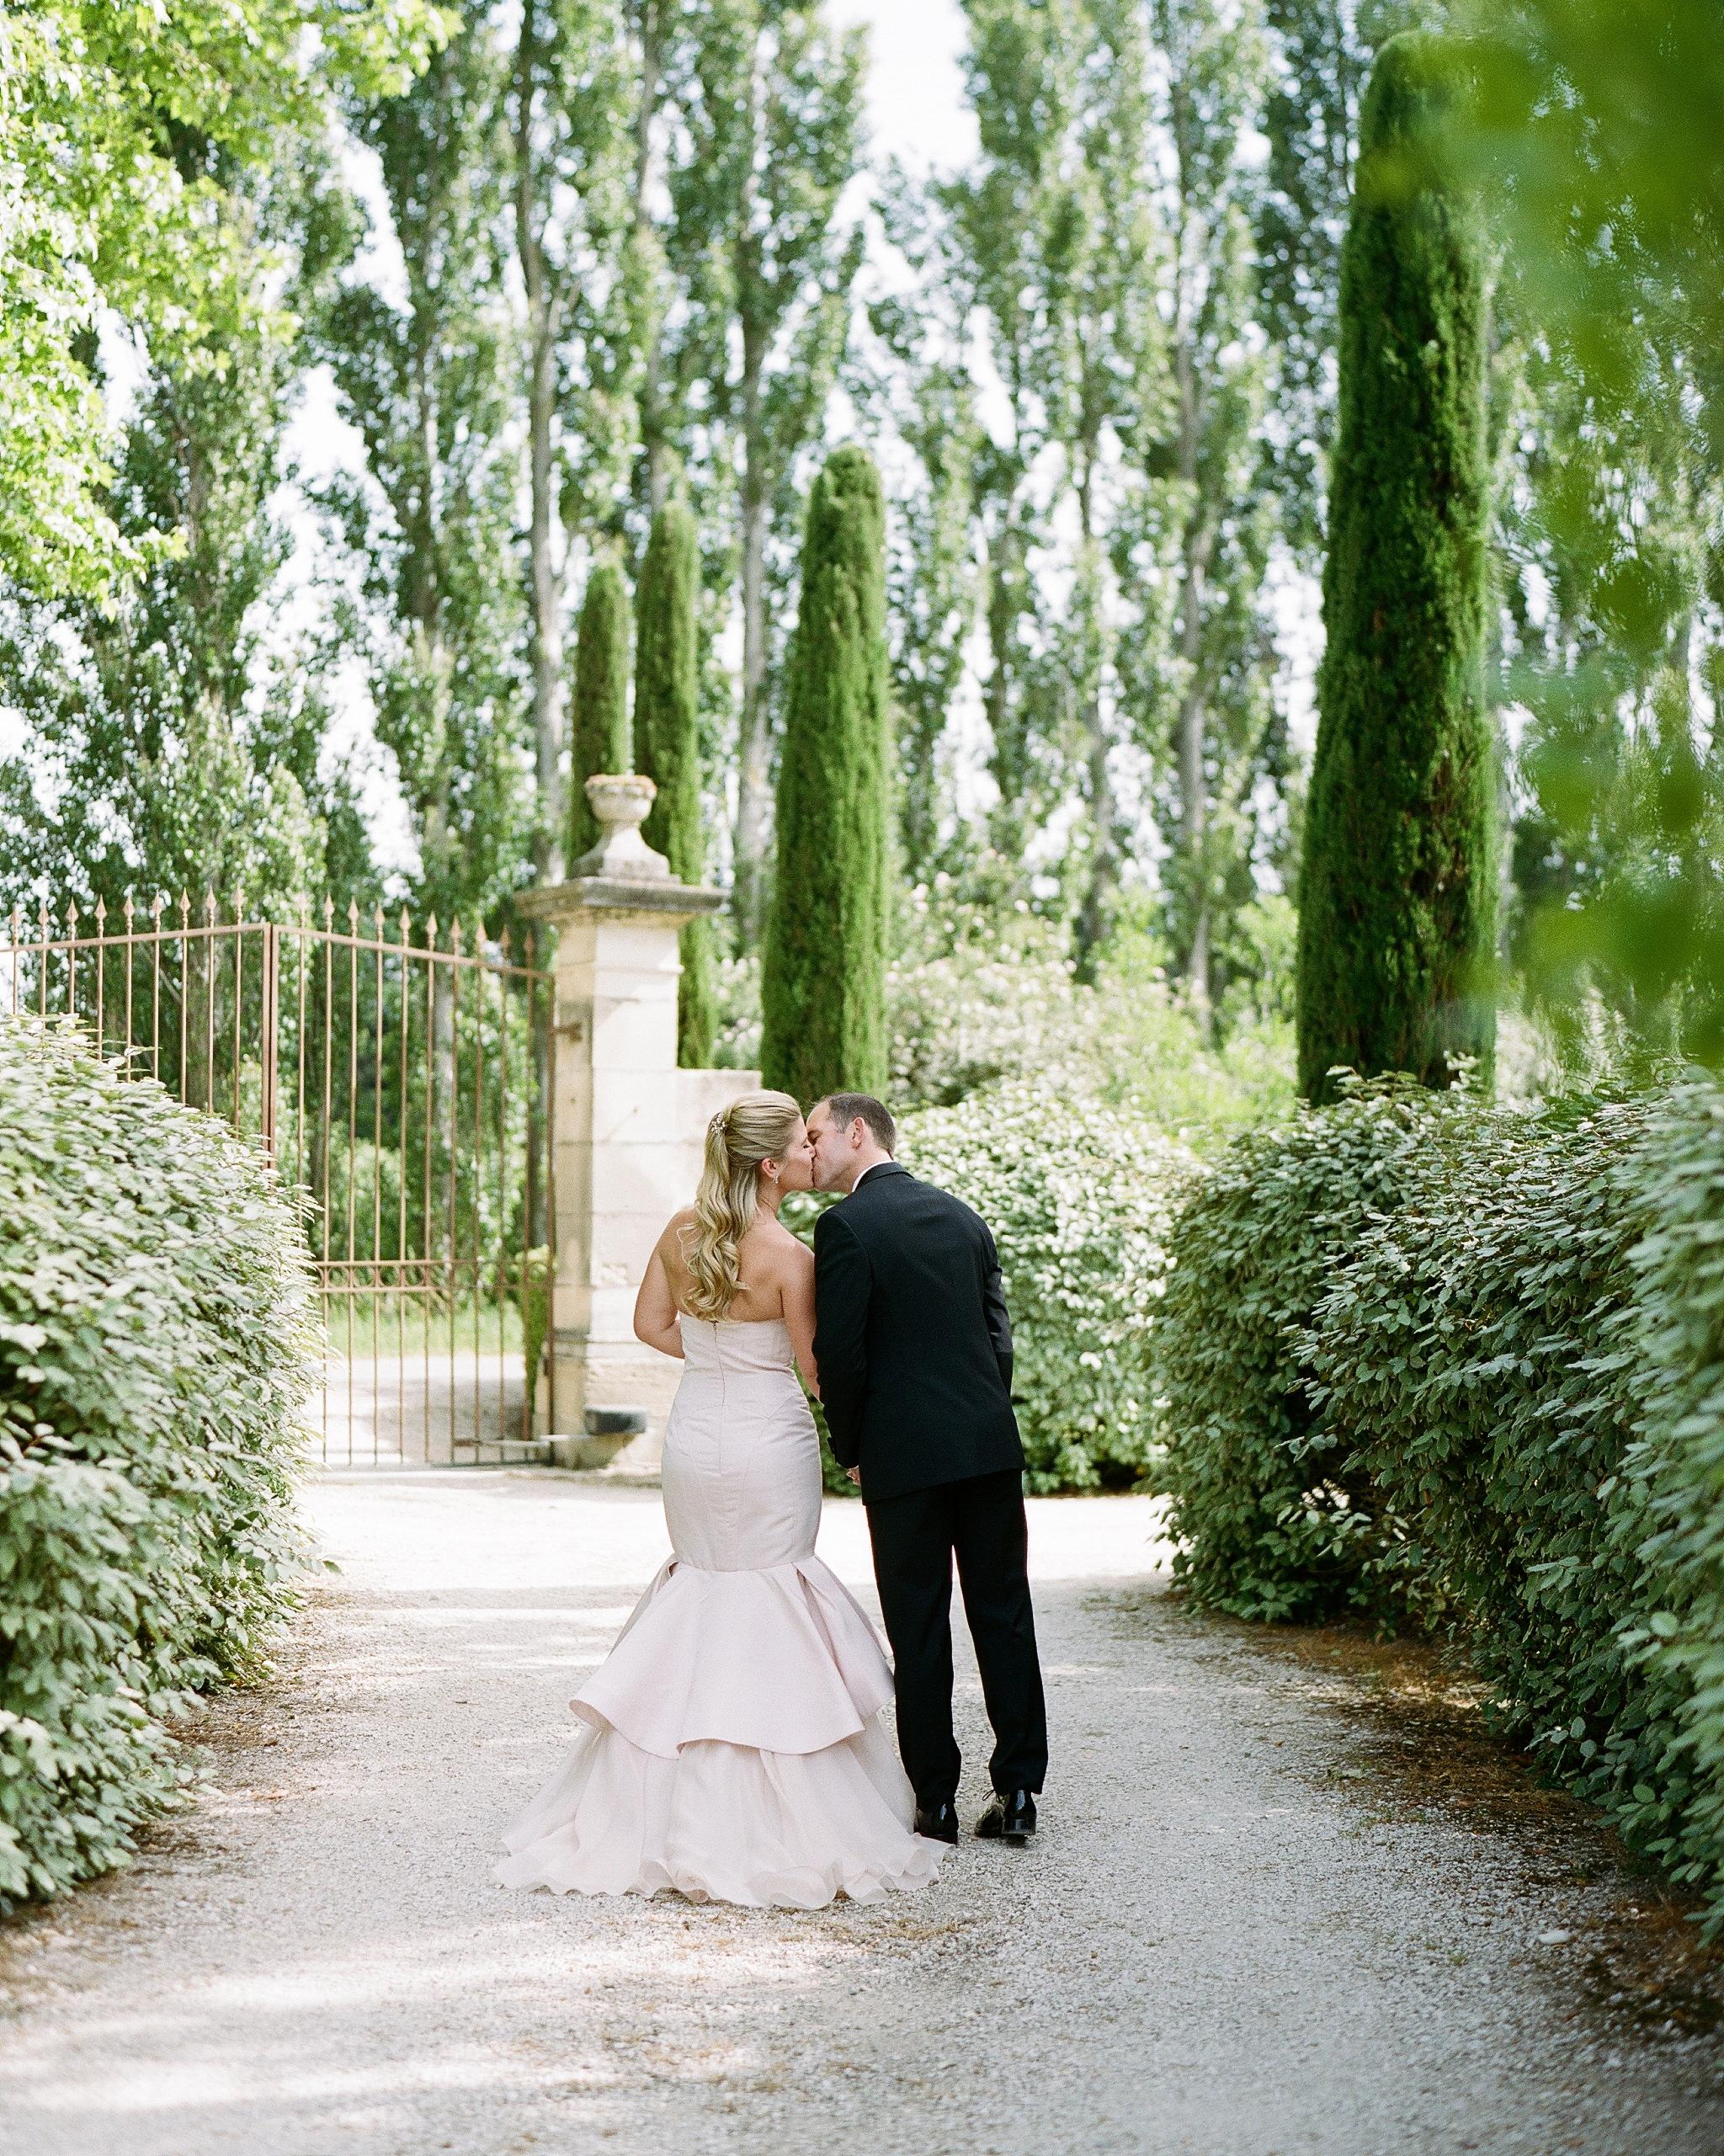 julie-chris-wedding-couple-0732-s12649-0216.jpg